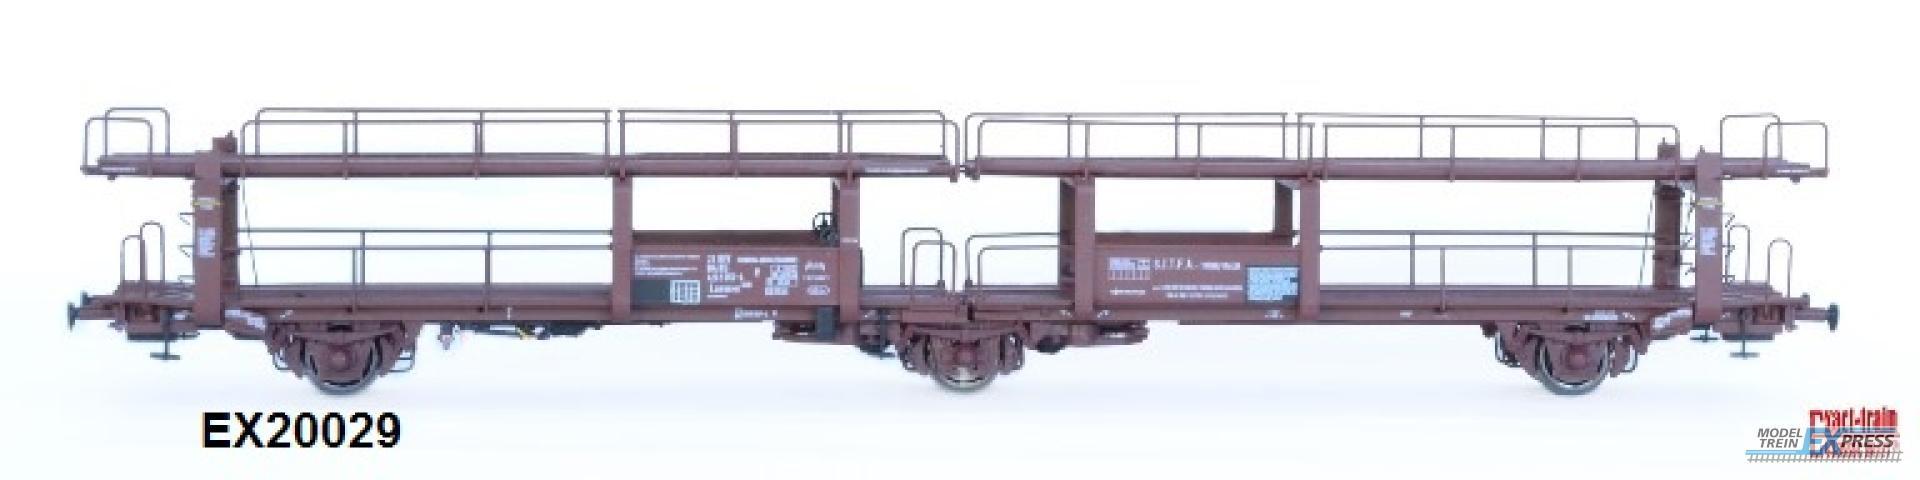 Exact-train 20029